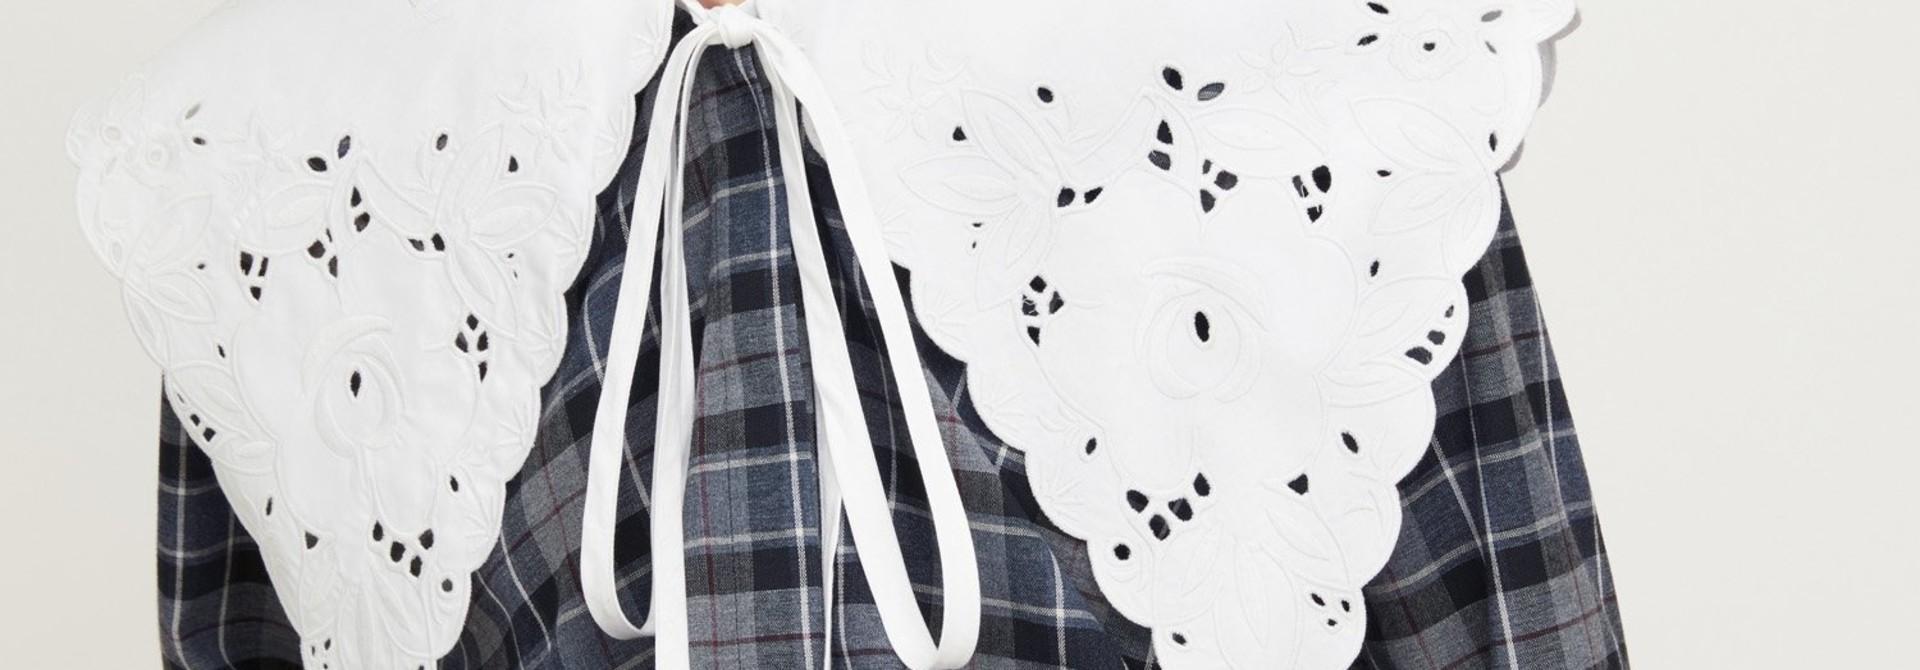 Embroidered Collar Cotton/Wool Shirt - Sz 38